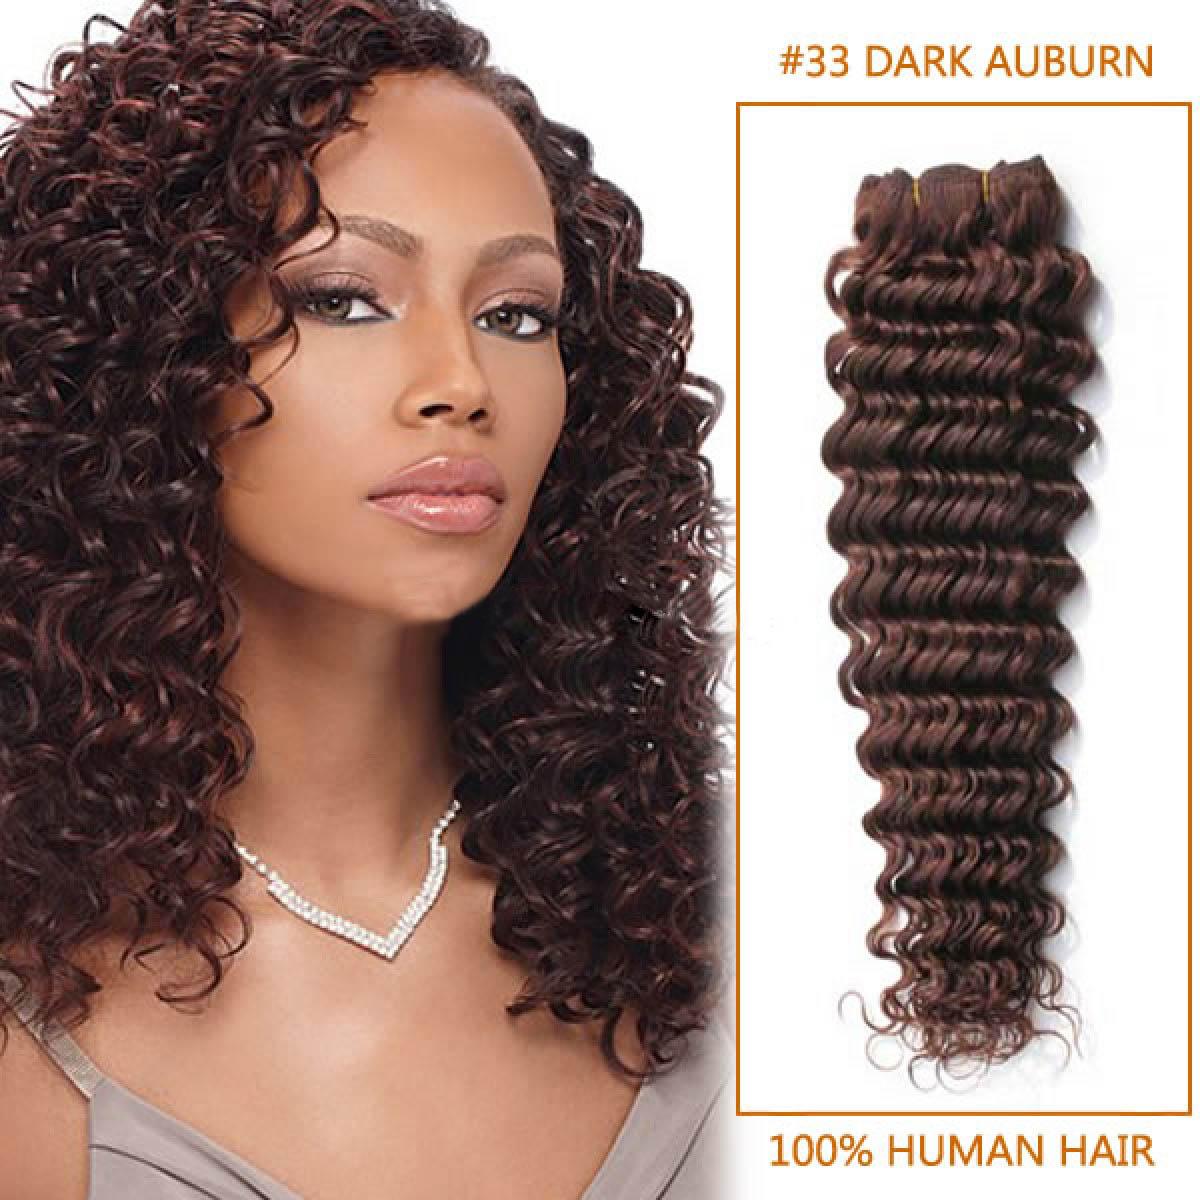 Looks - Deep brazilian wave hair with bangs video